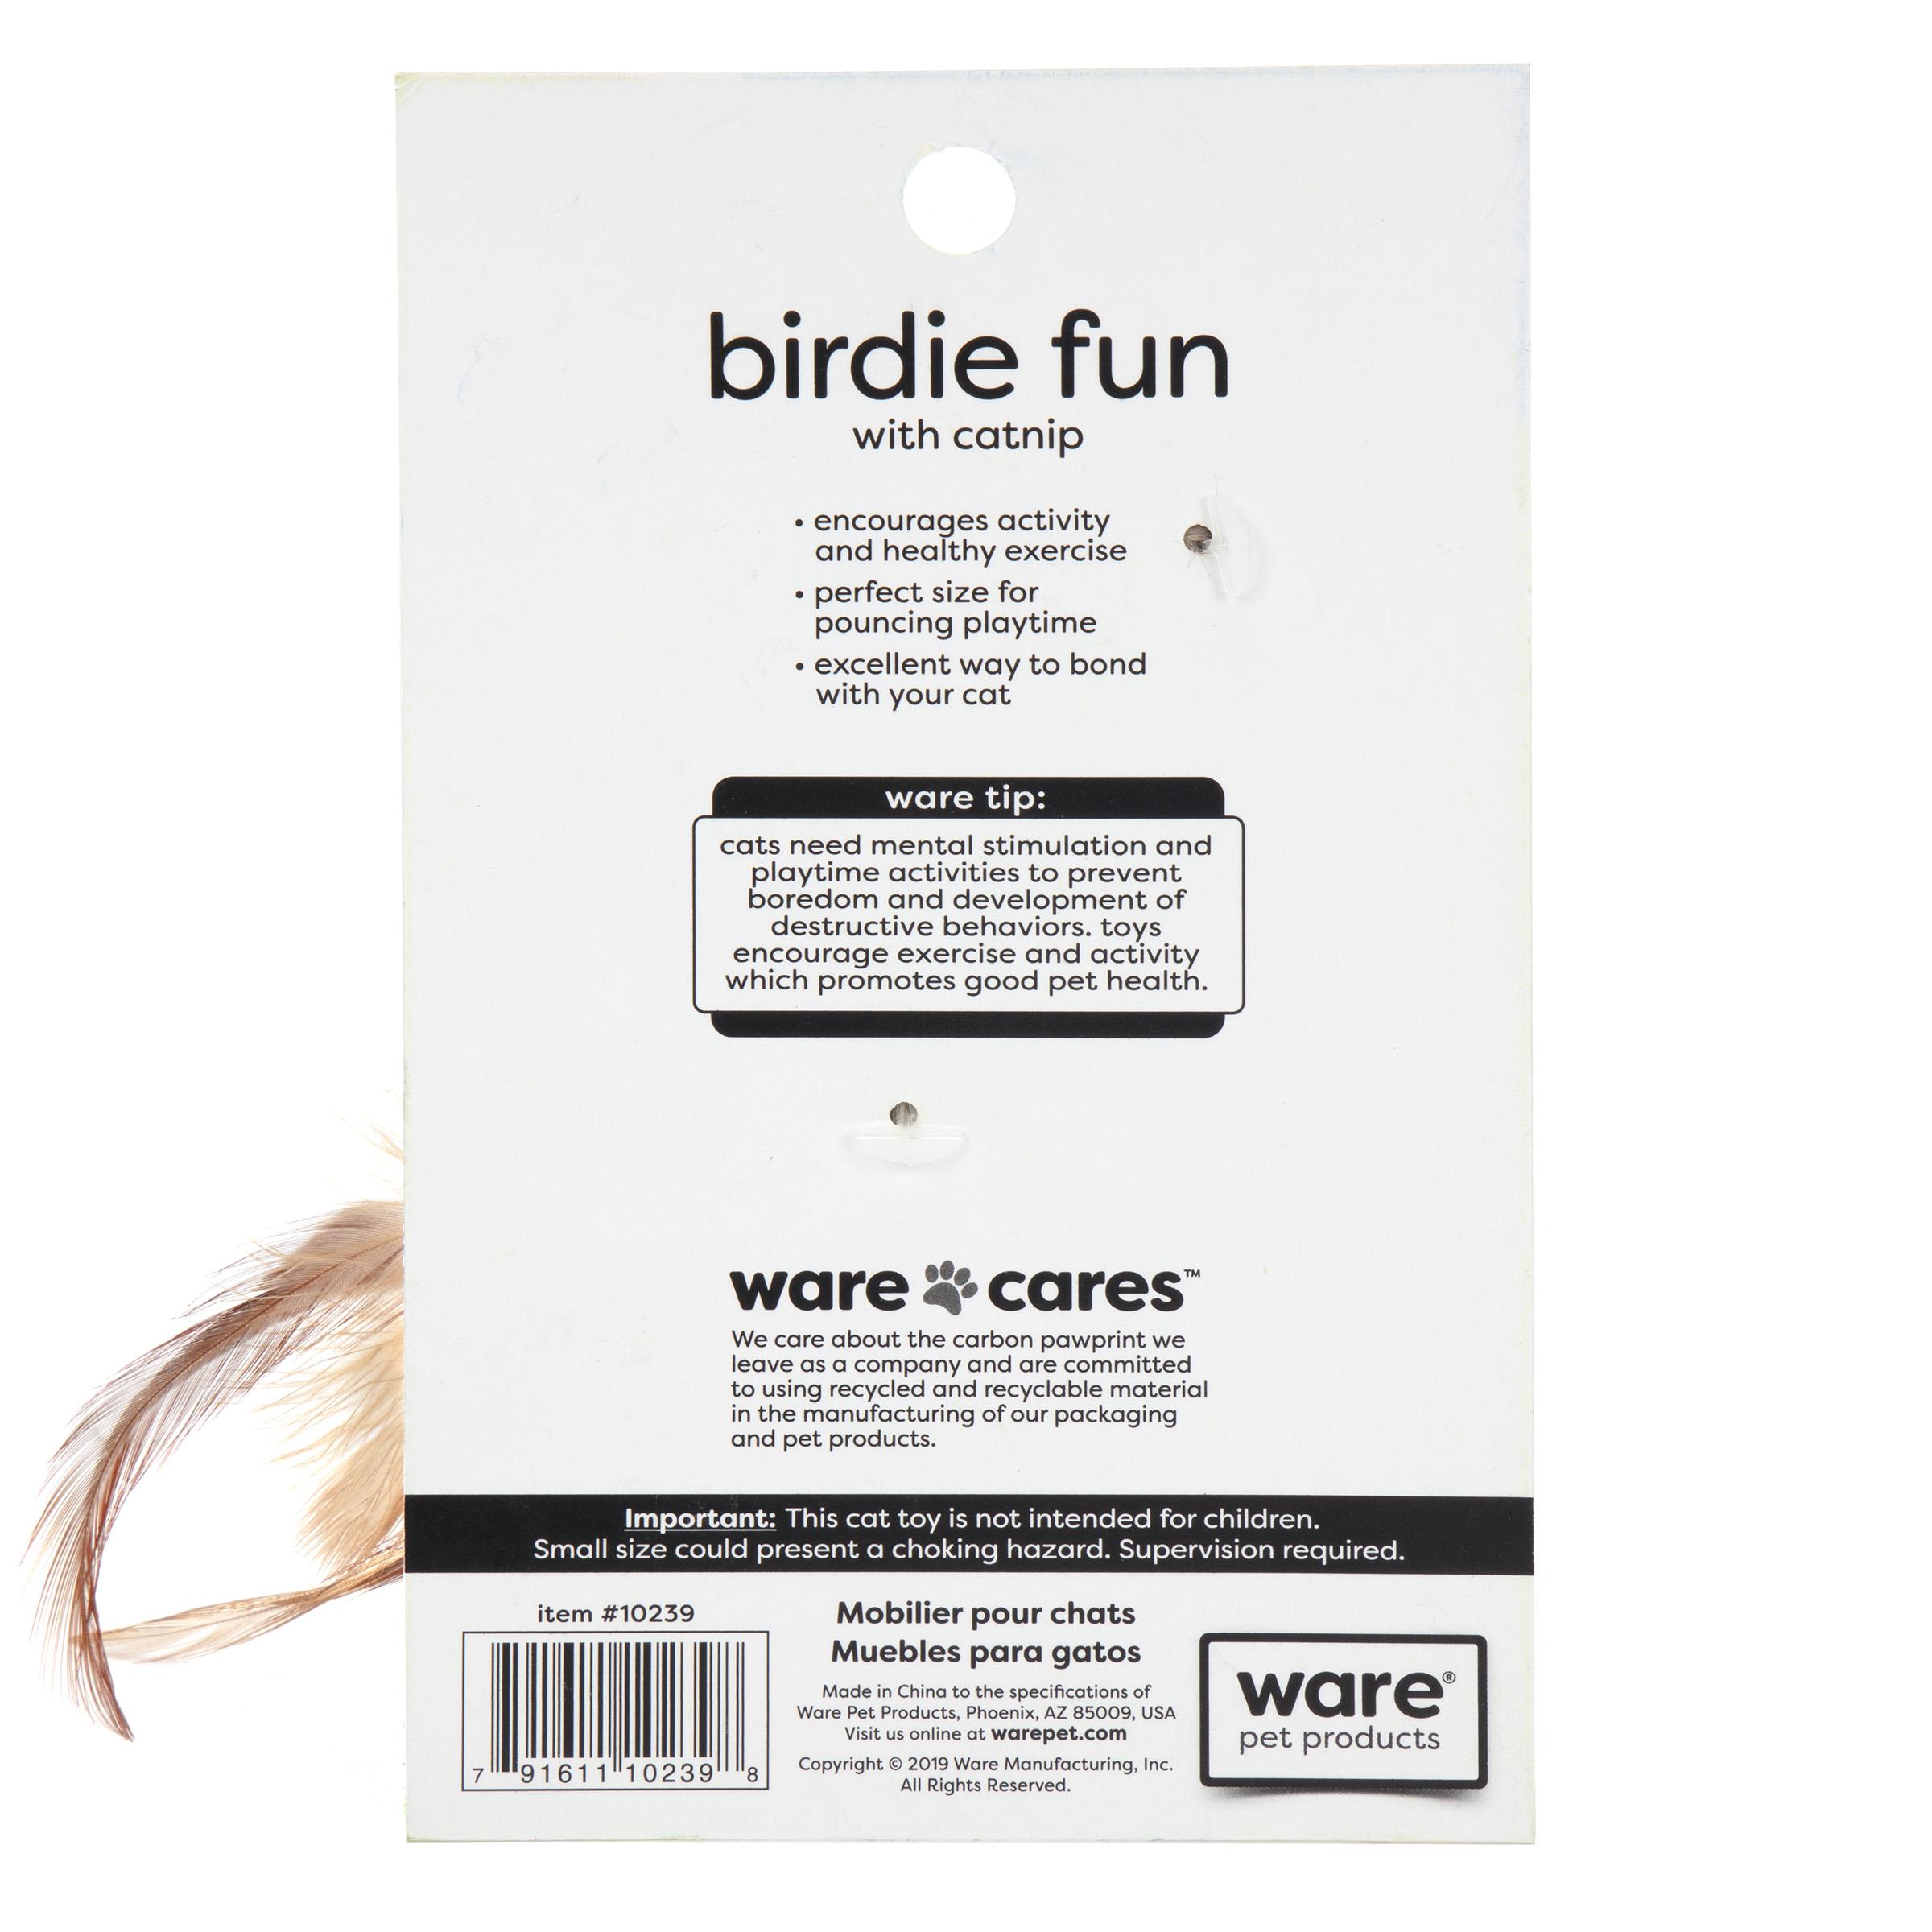 Birdie Fun